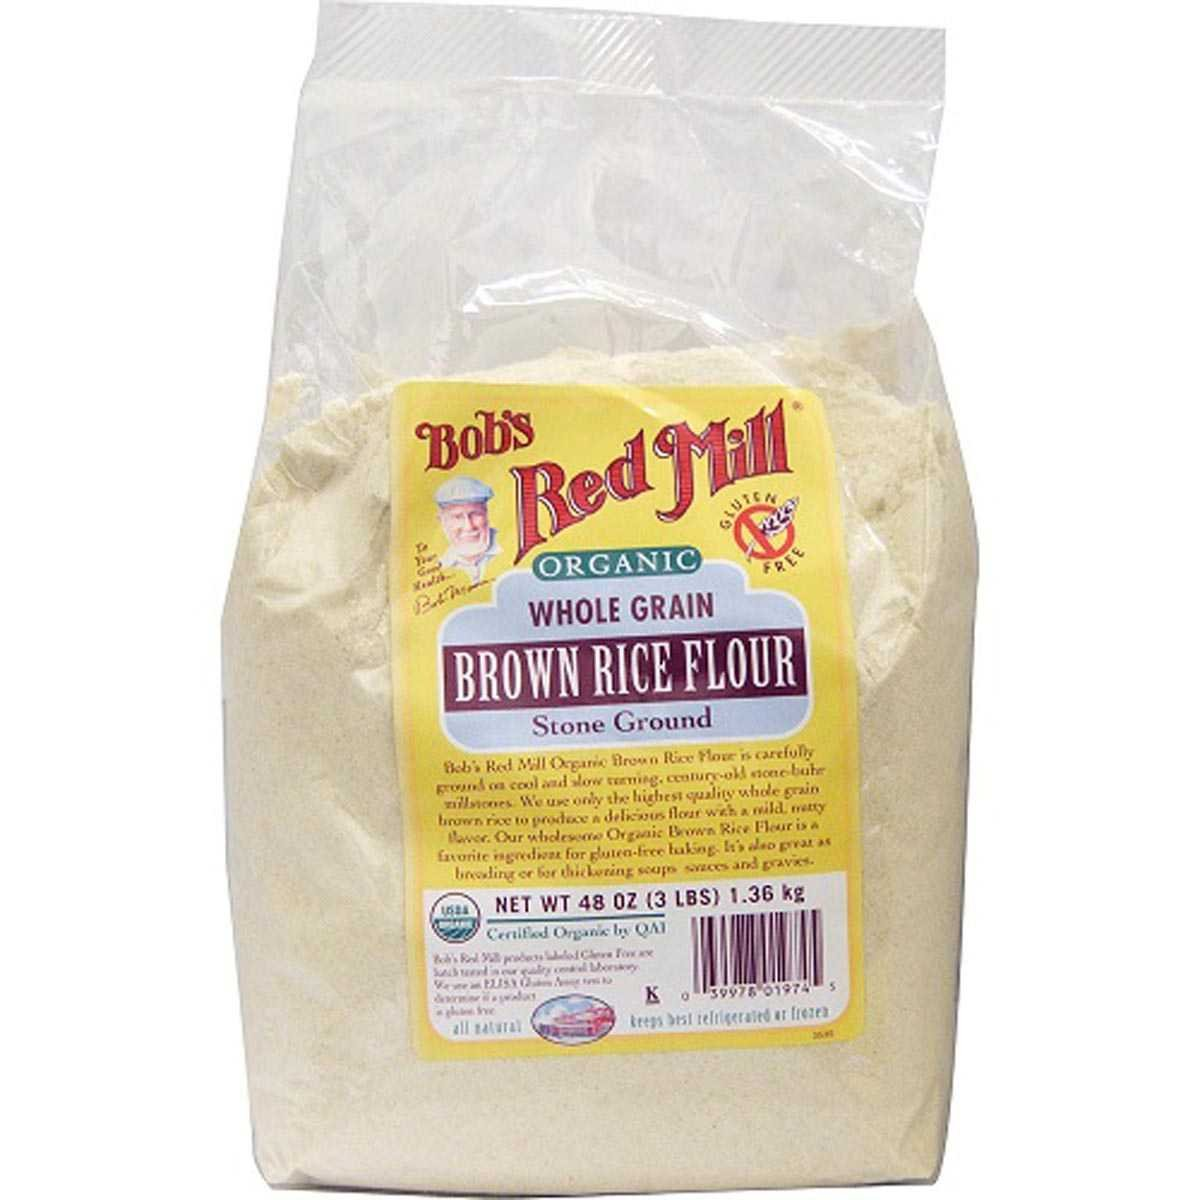 Bob's Red Mill Organic Brown Rice Flour - 25 lb - Bulk Bag